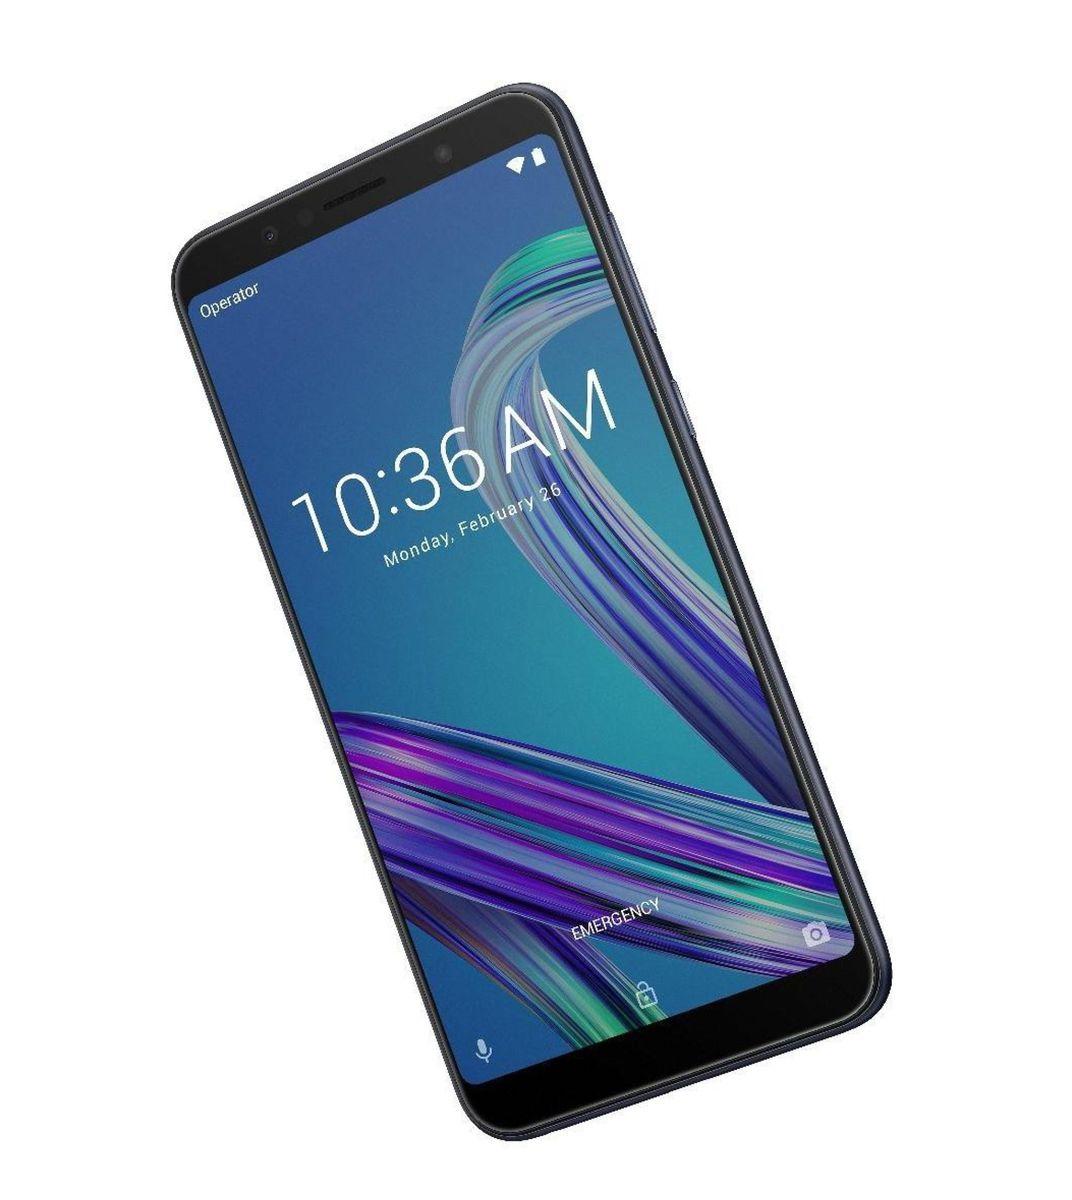 Анонсы Asus Zenfone Max Pro M1 дебютирует со Snapdragon 636 и АКБ 5000 мАч